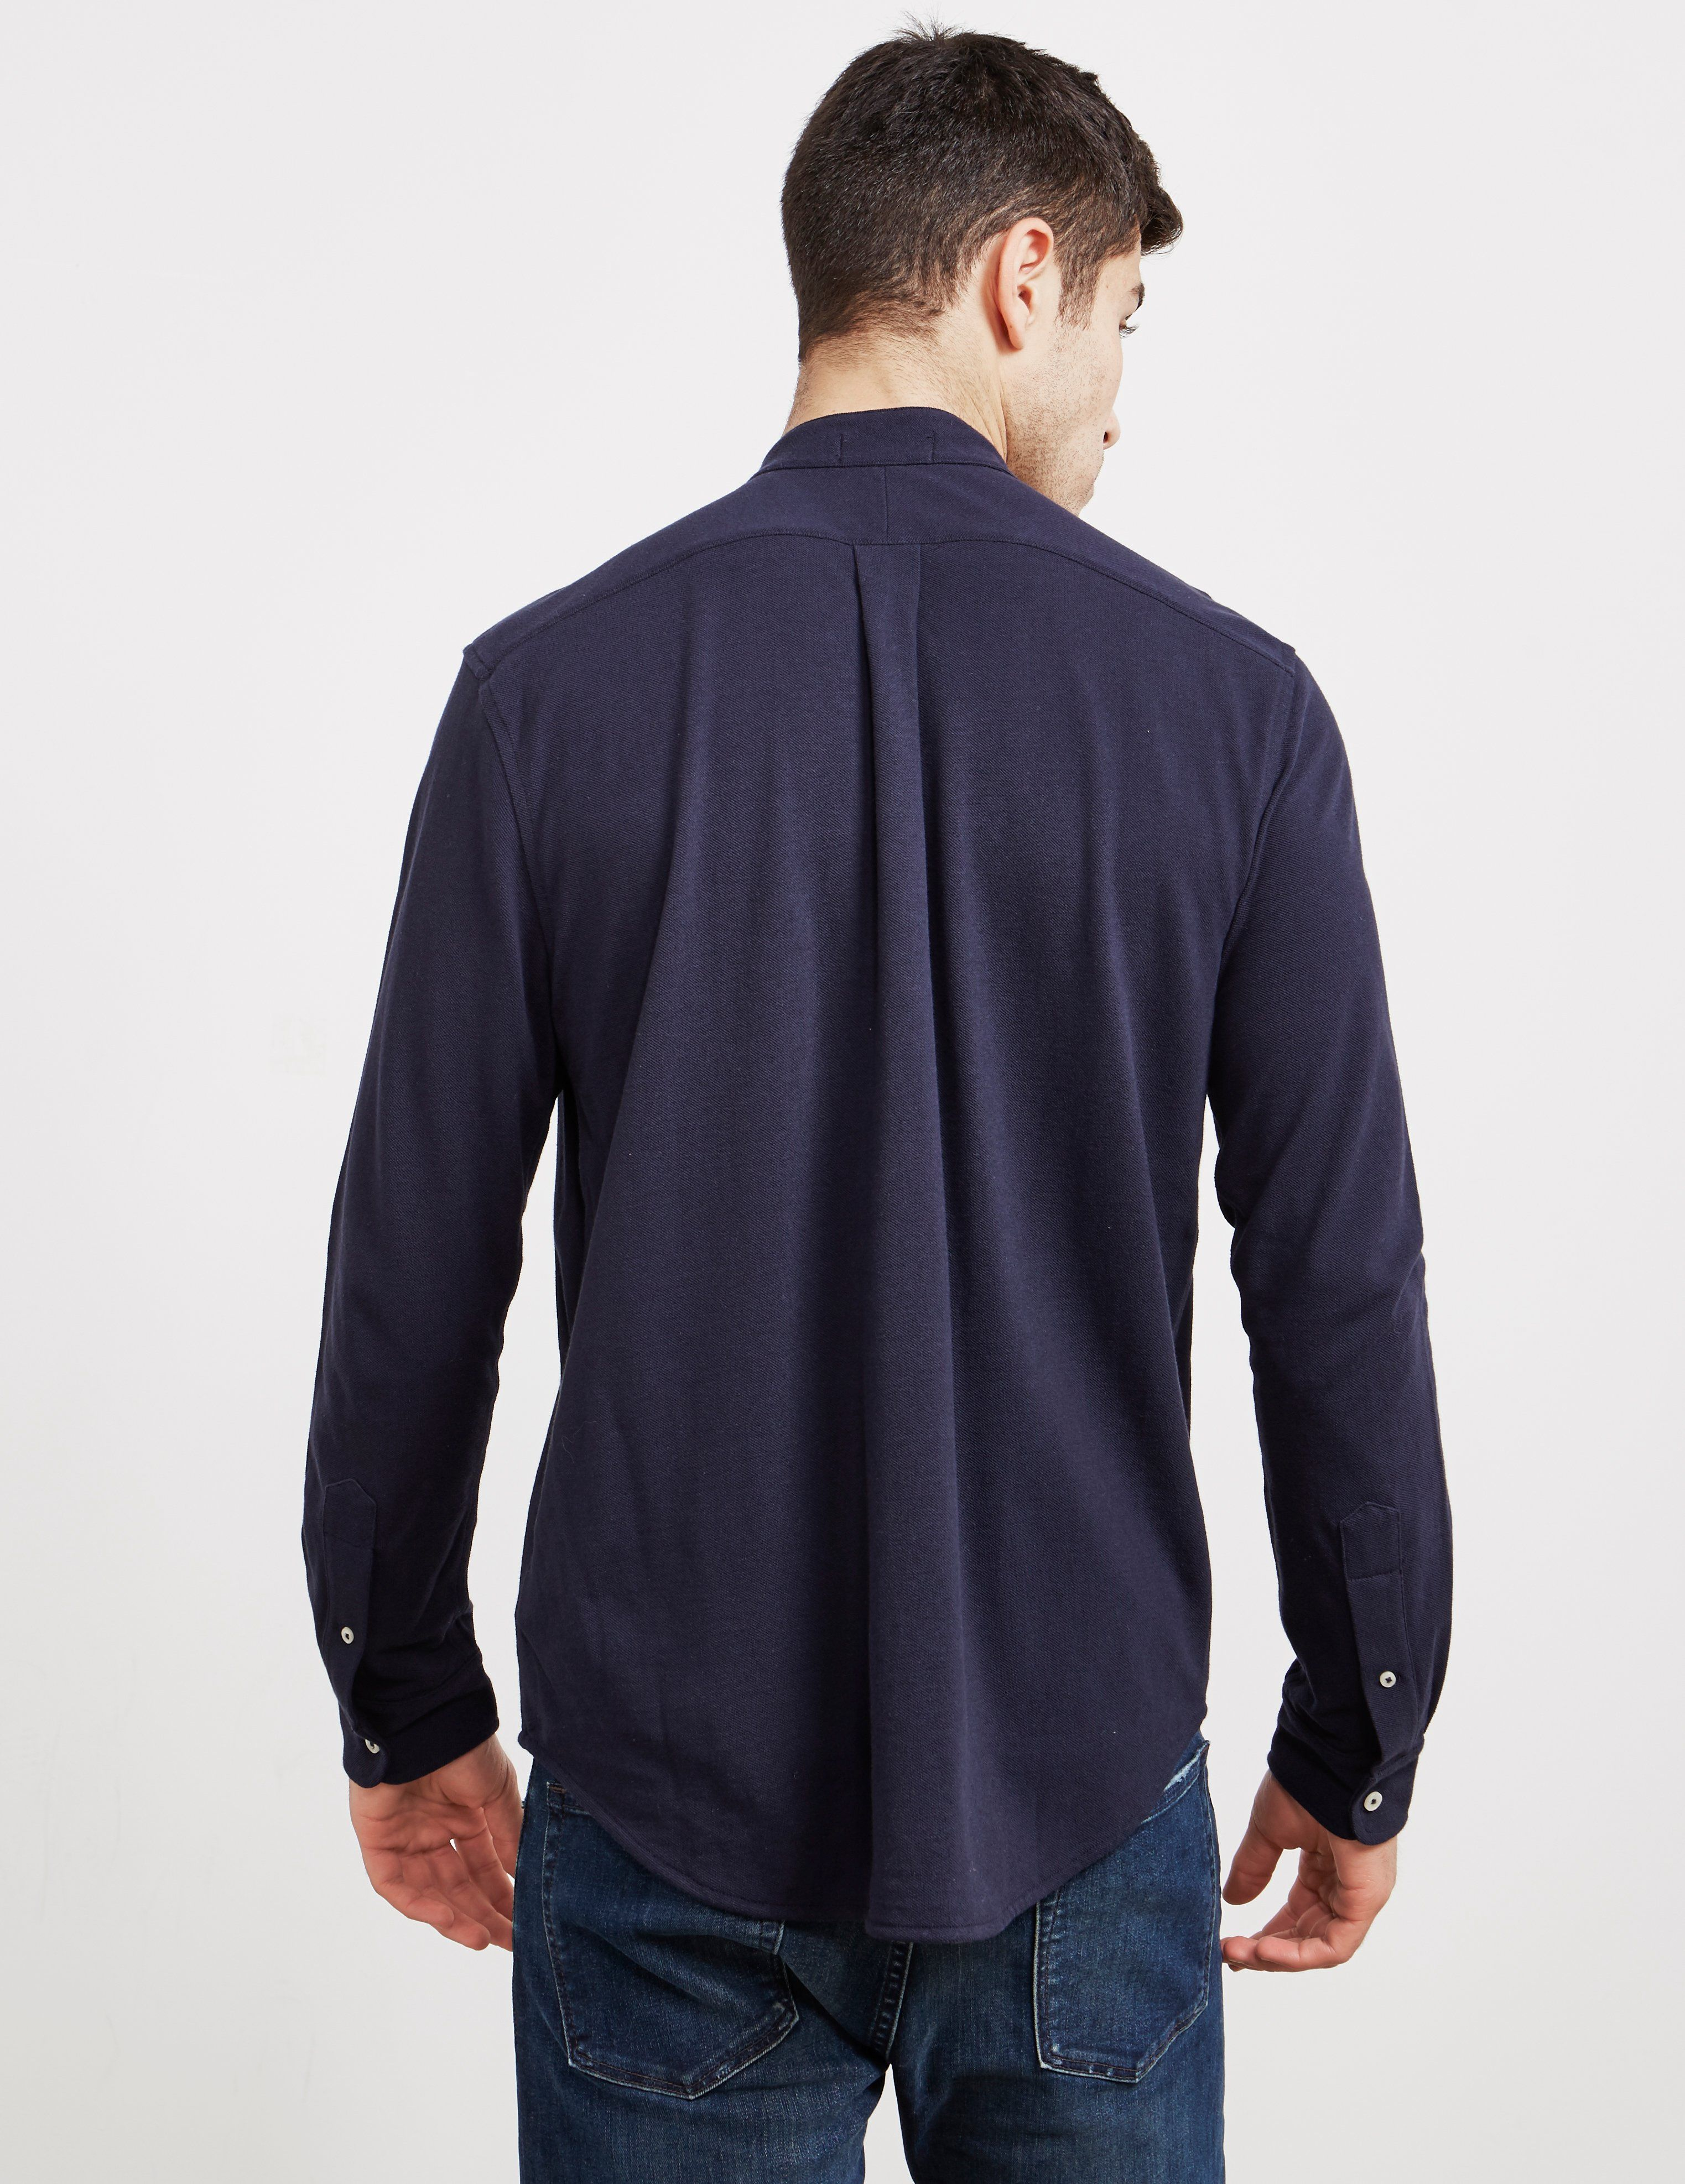 Polo Ralph Lauren Grandad Collar Long Sleeve Shirt - Exclusive